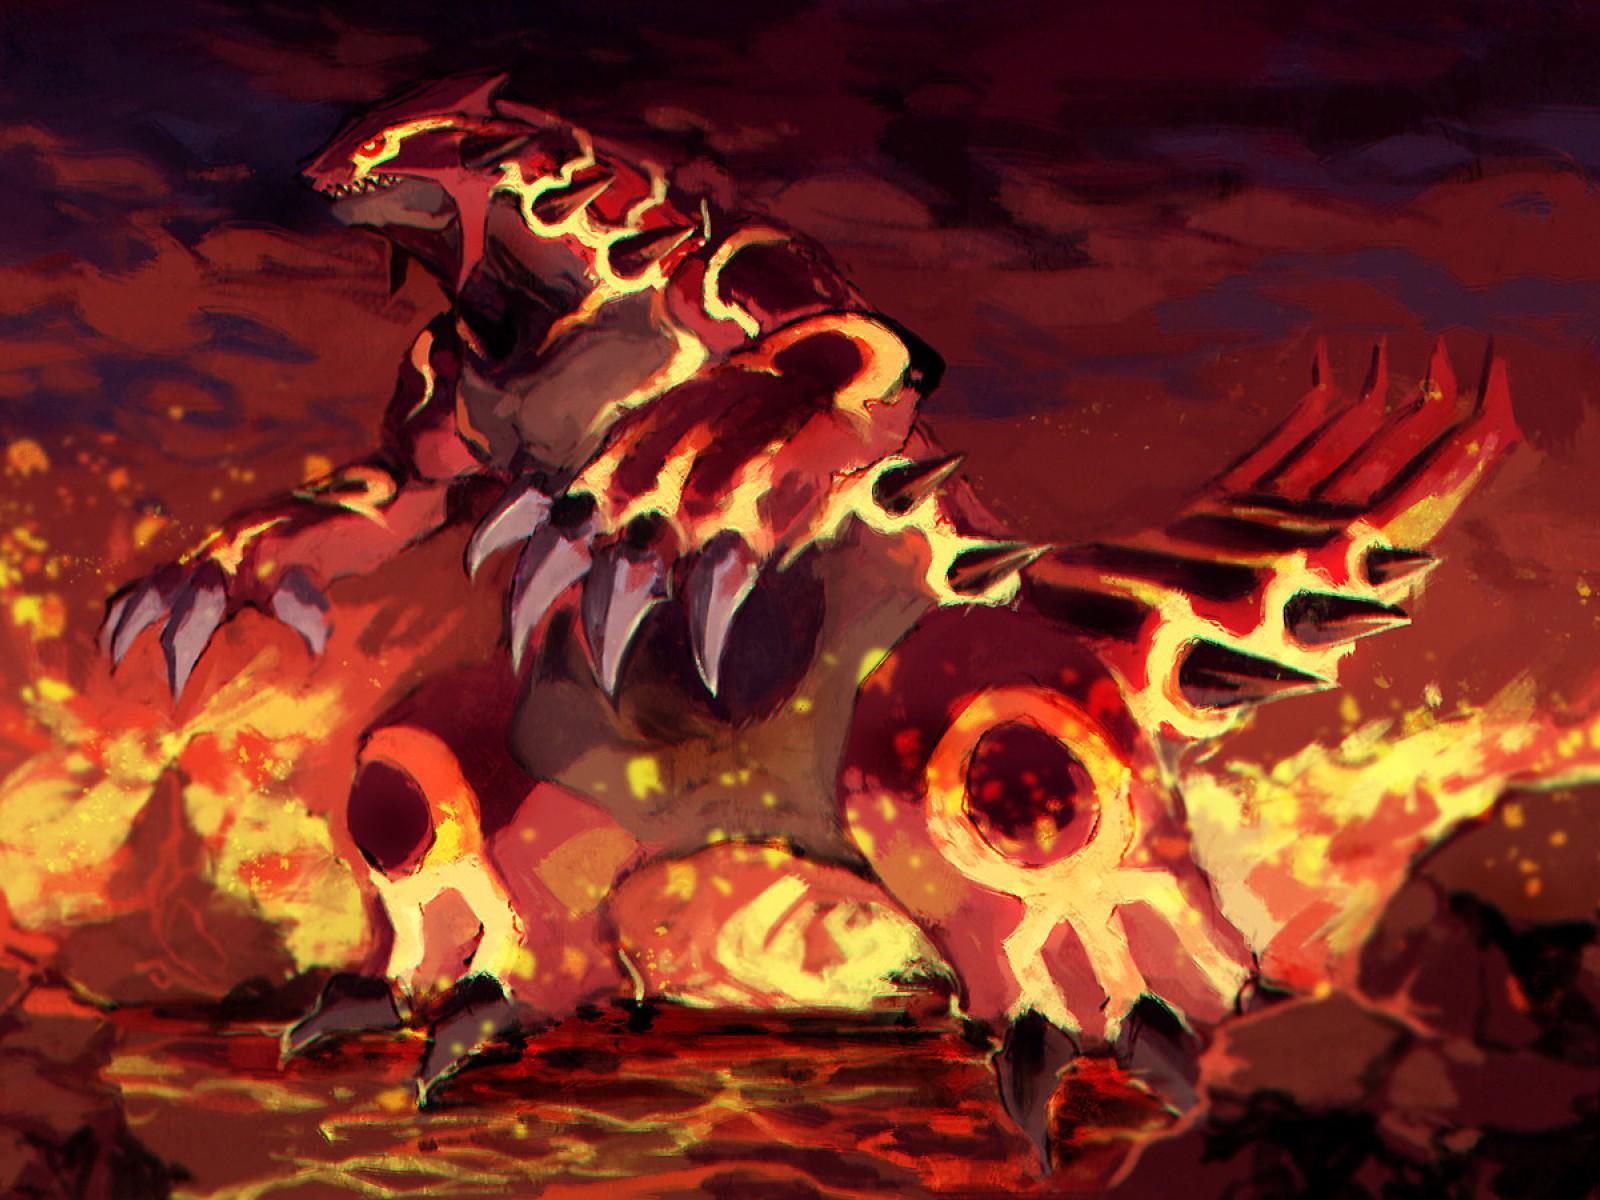 Pokémon Ruby Wallpapers Wallpaper Cave